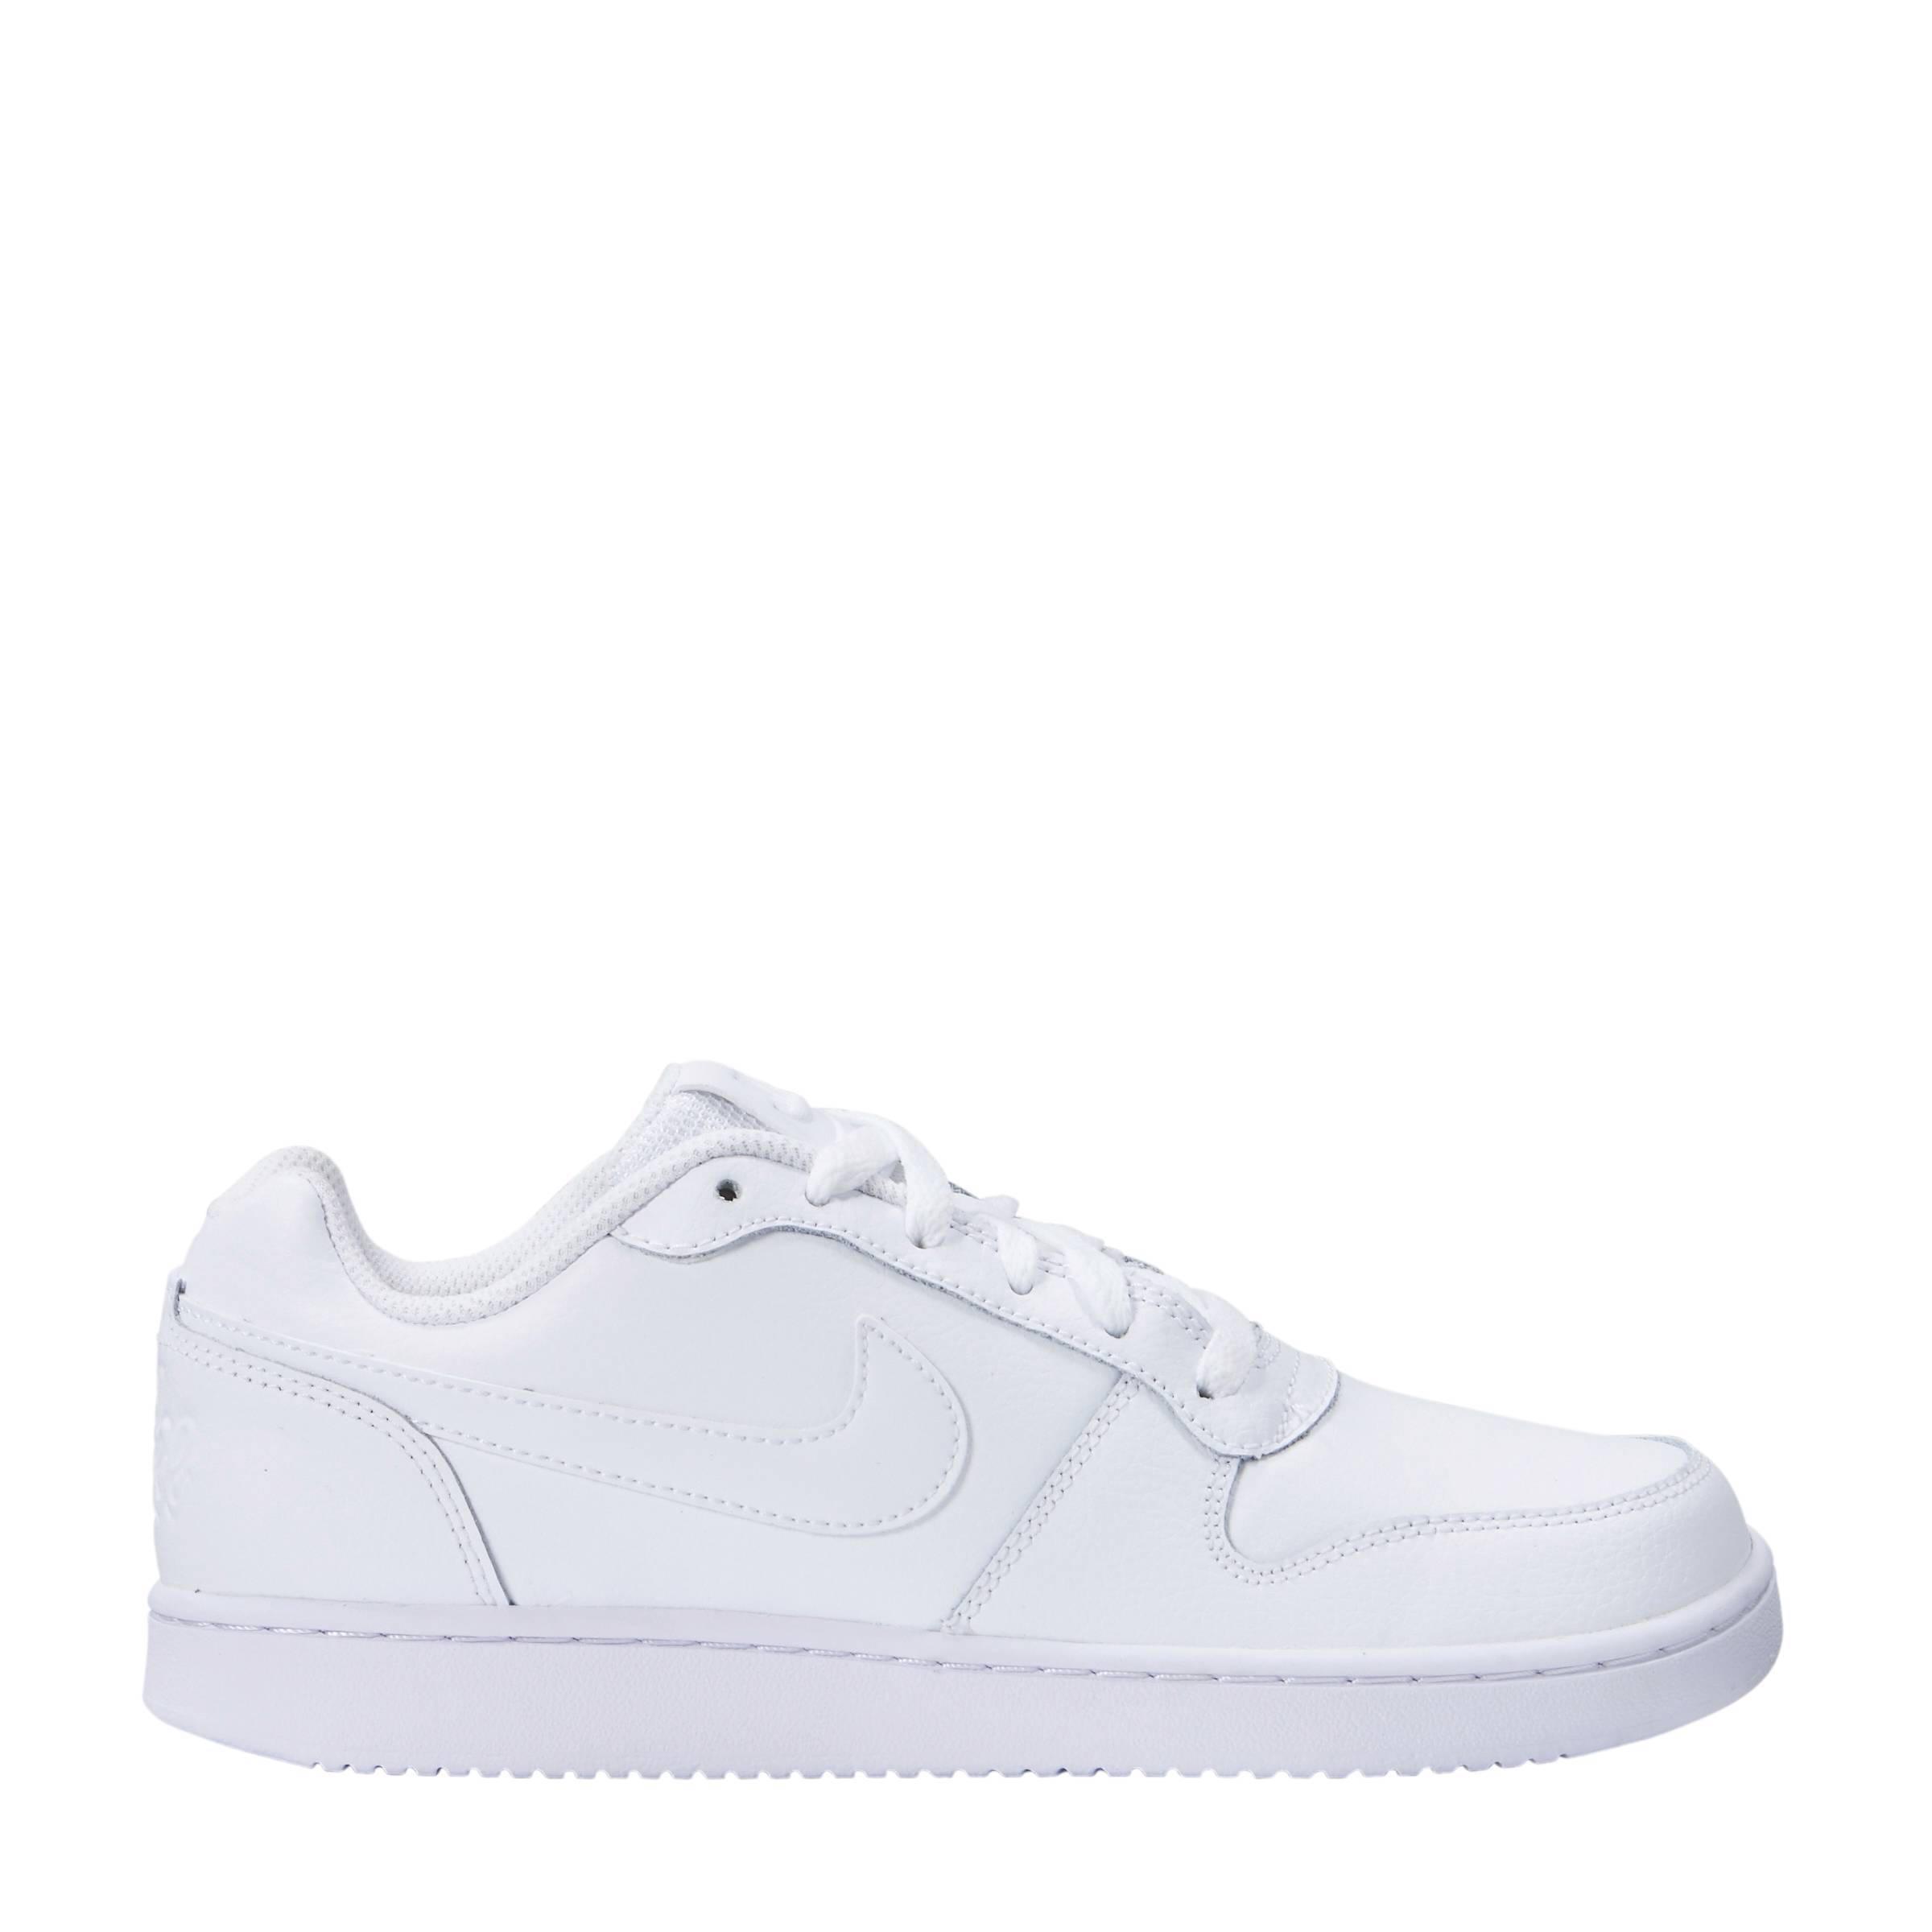 Schoenen Schoenen Witte Nikekjh55 Agneswamu Super Witte Agneswamu Witte Nikekjh55 Super Super QCdBWrxeo